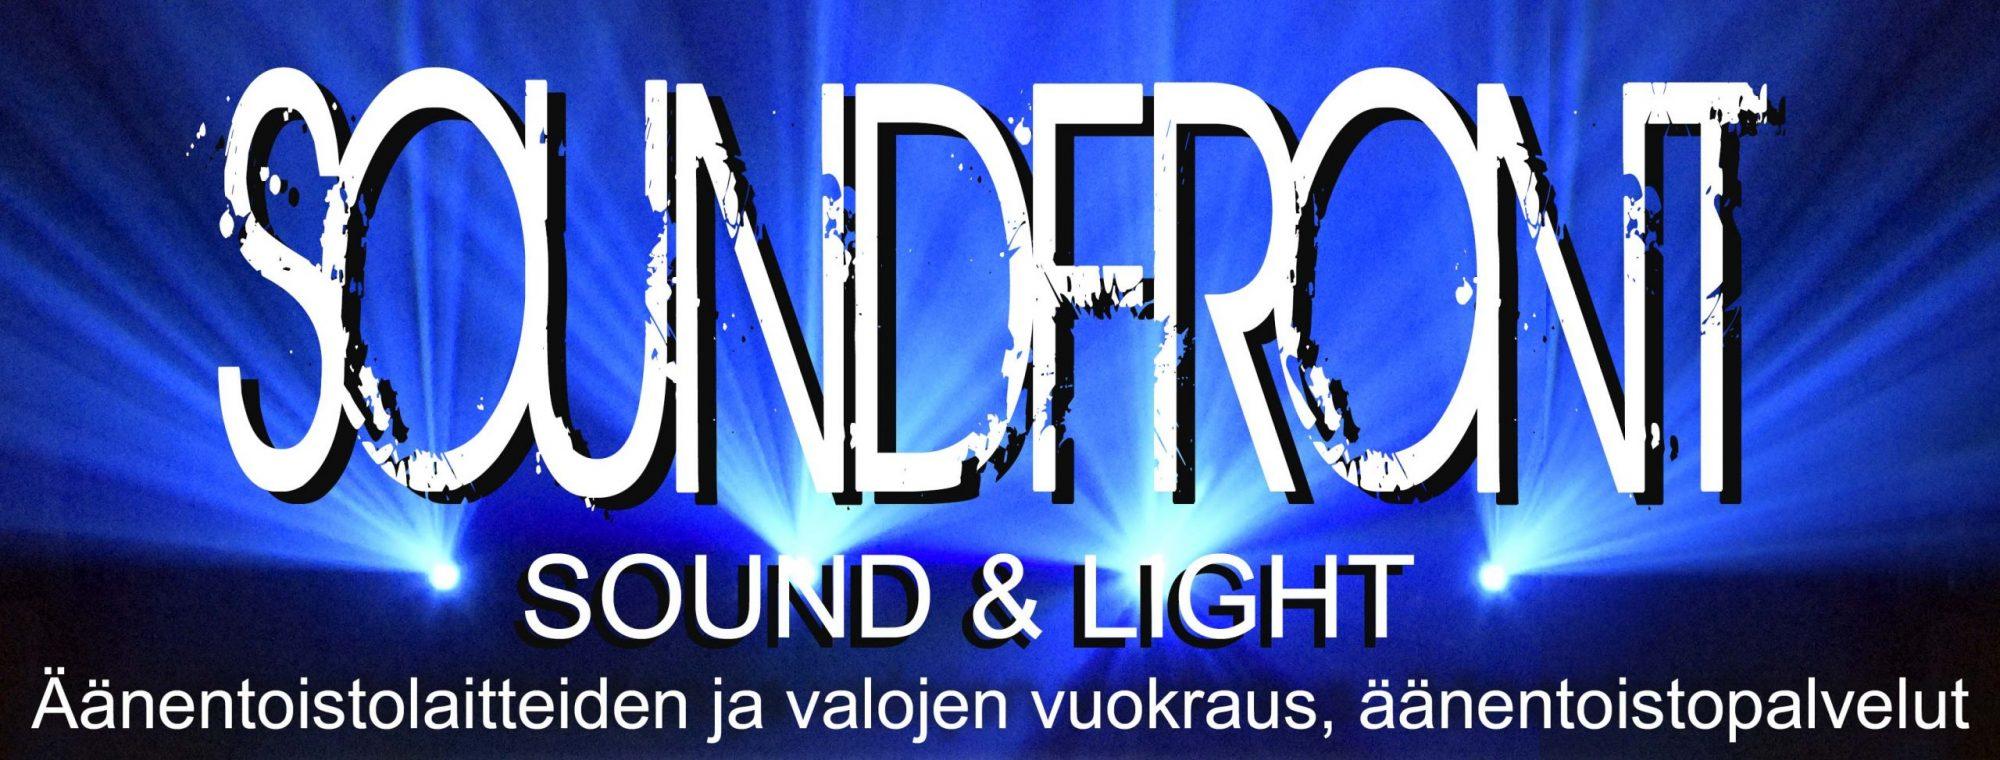 Soundfront.fi